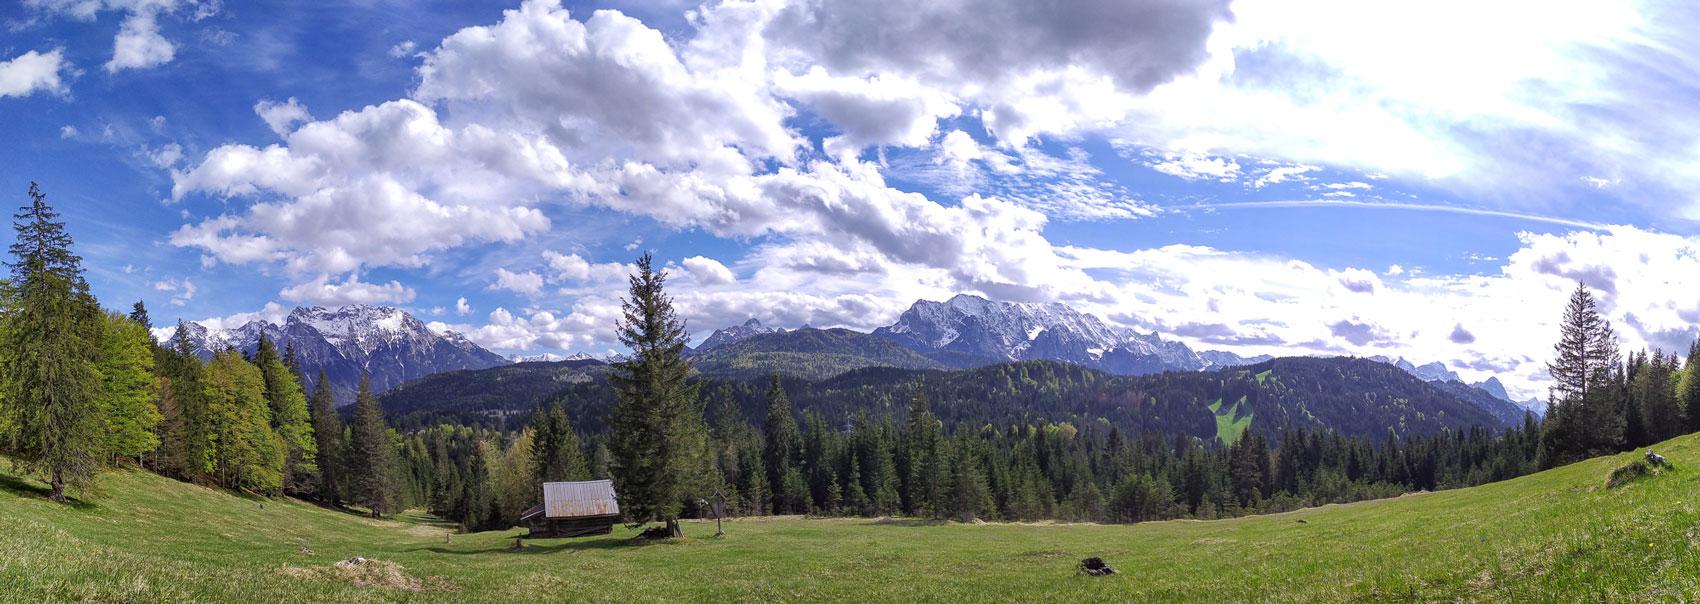 Frühlingswiese in der Alpenwelt bei Klais